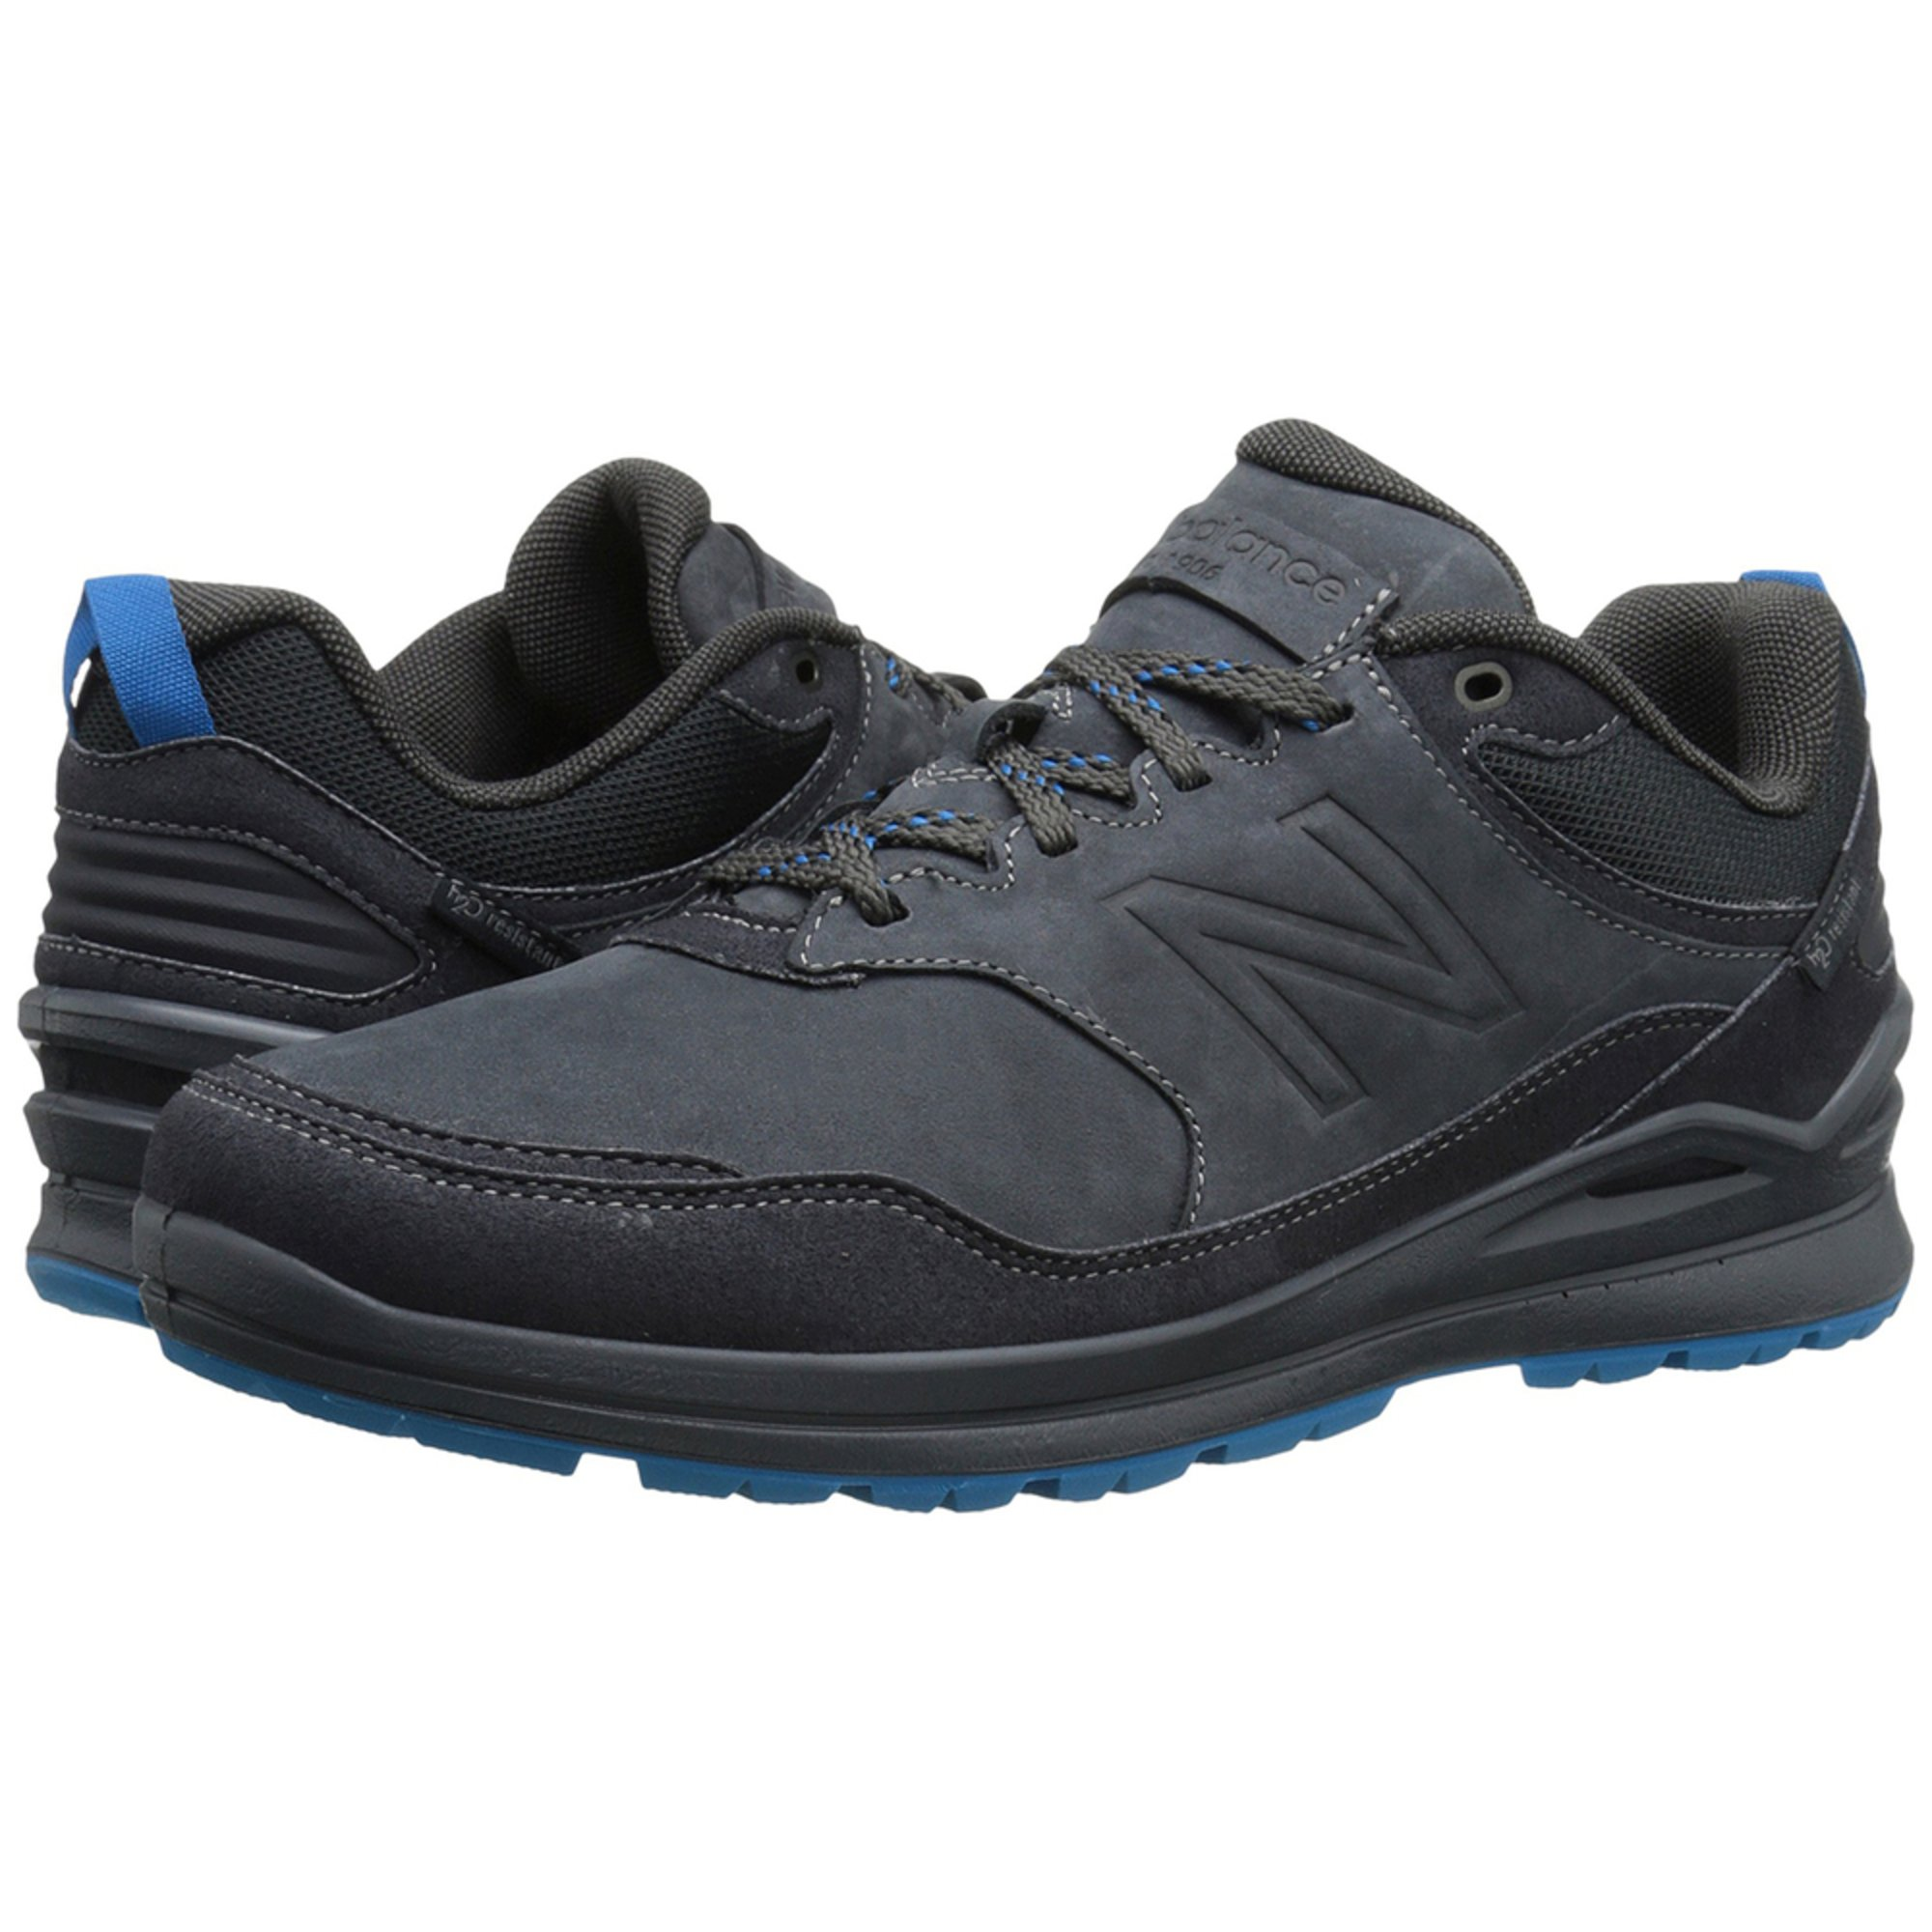 new balance mw3000gr s walking shoe shoes shop